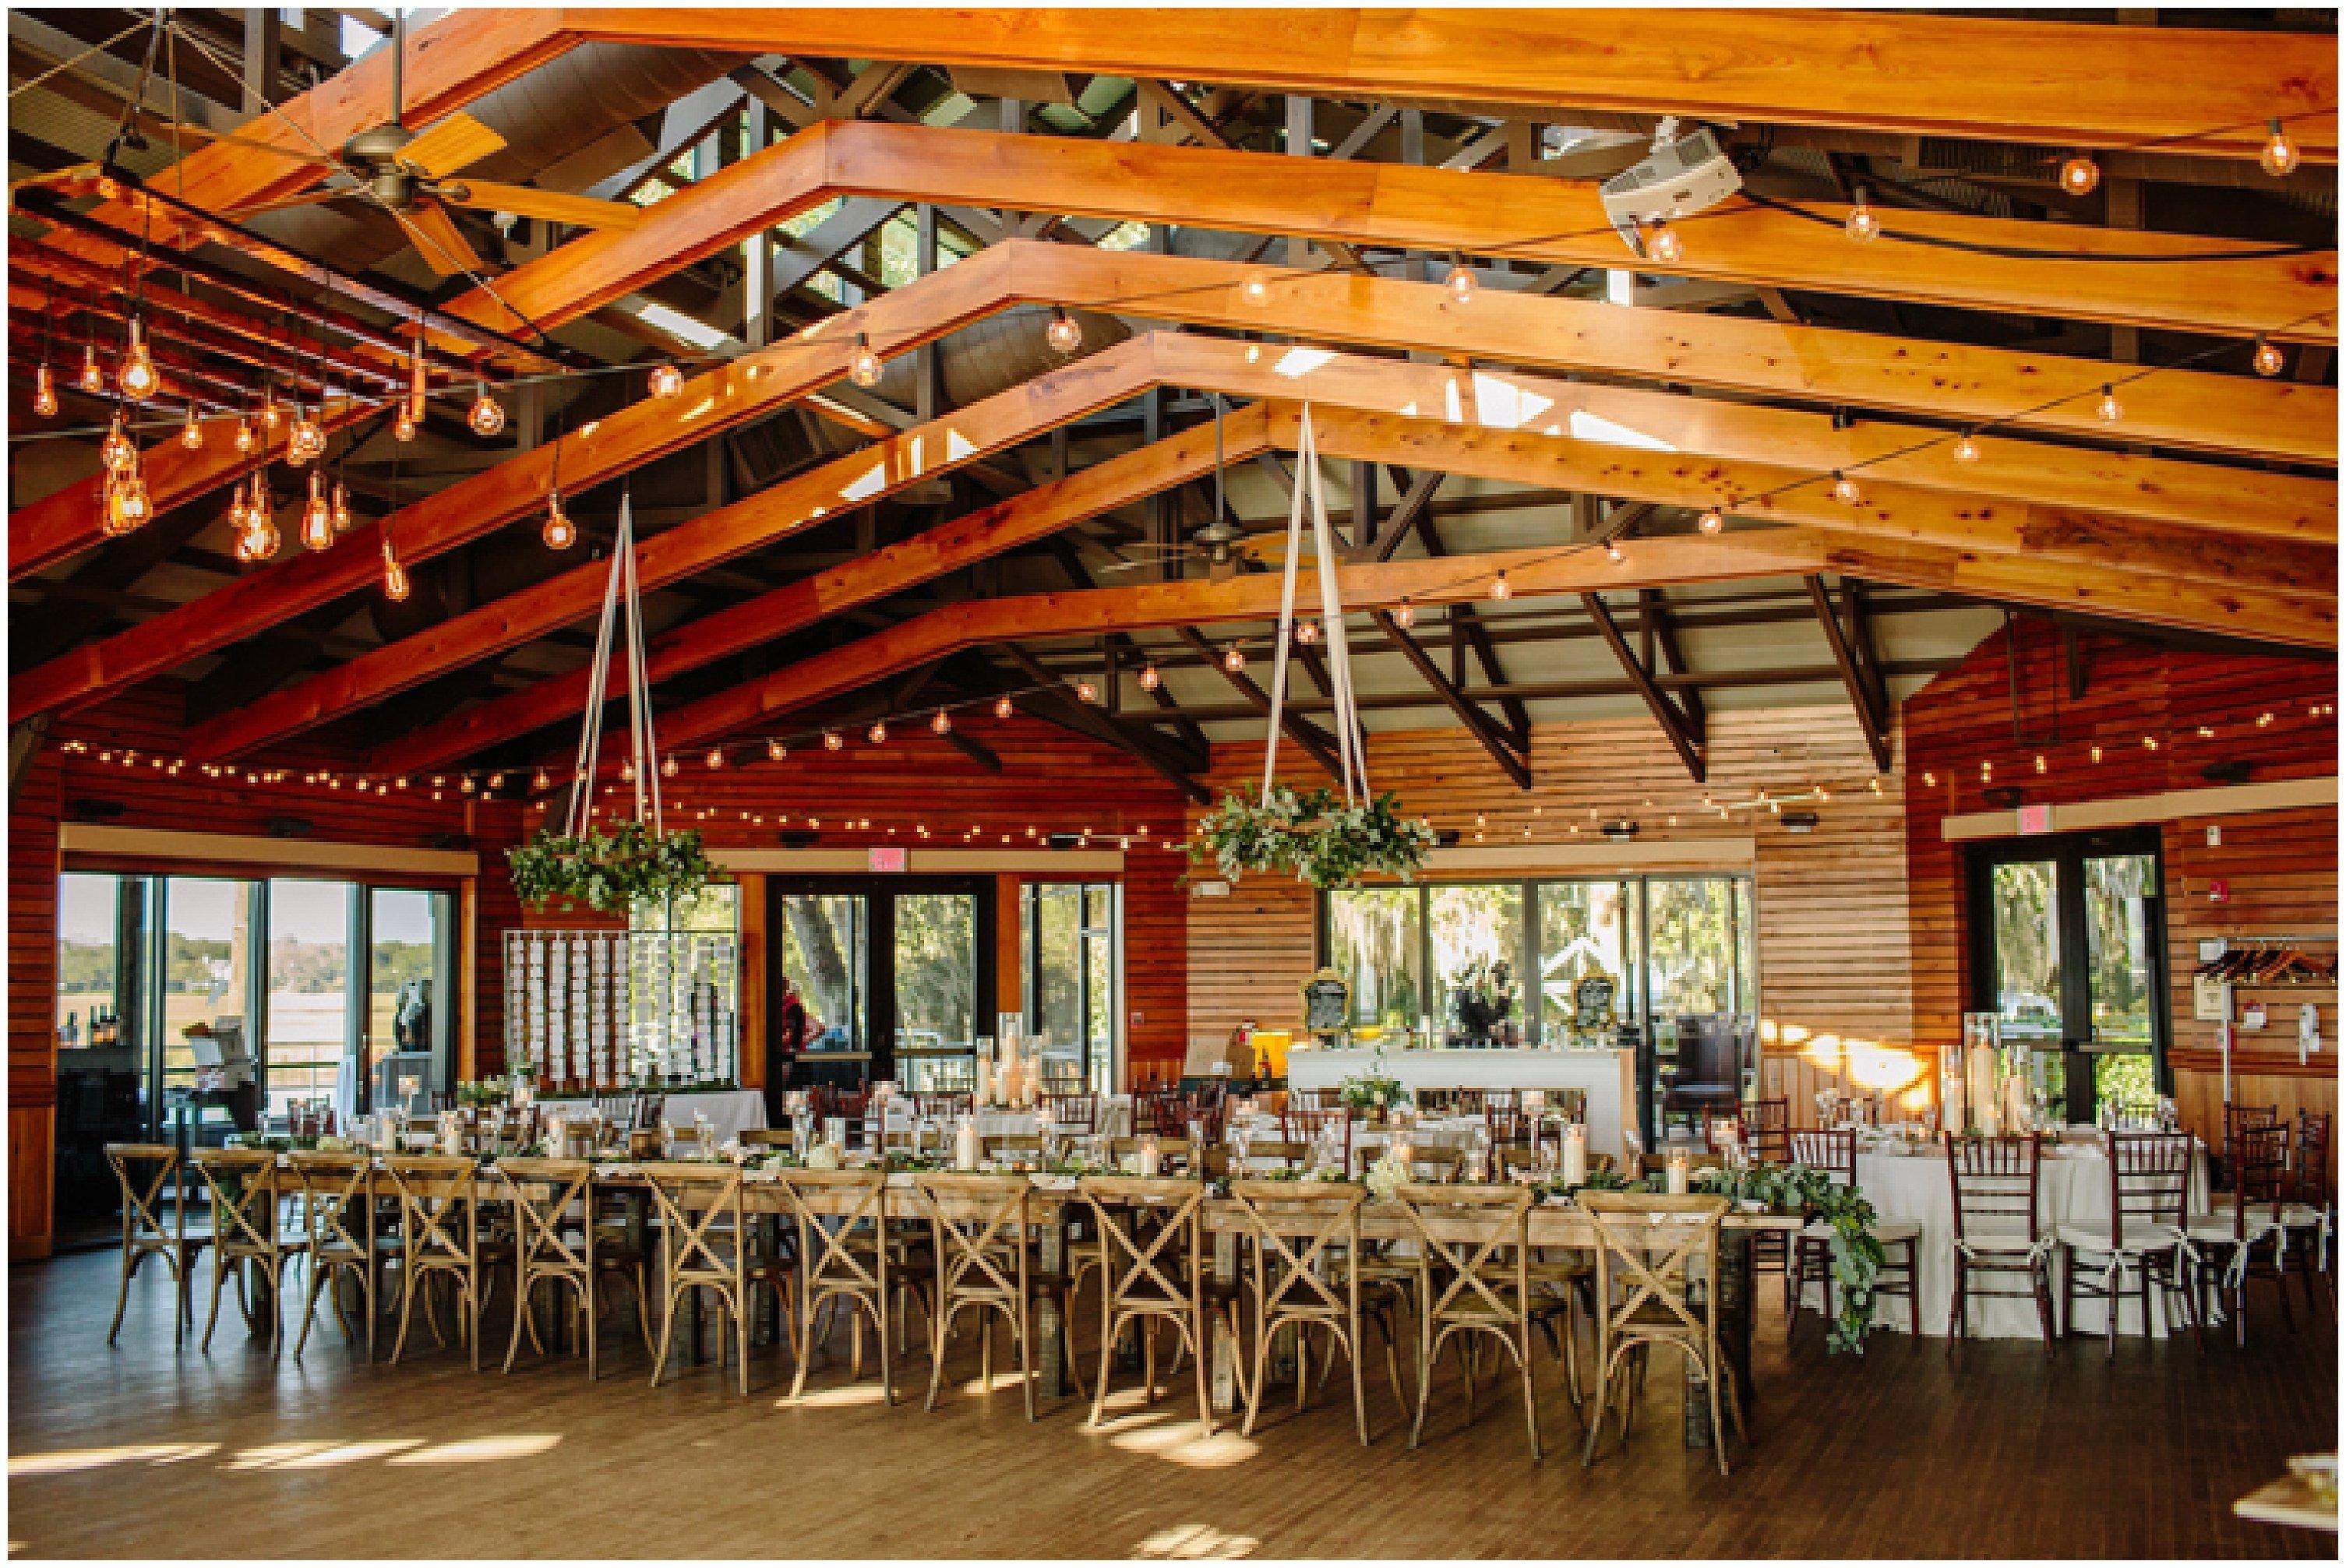 Walkers Landing Feasting Table Centerpiece Design Omni Amelia Island Plantation